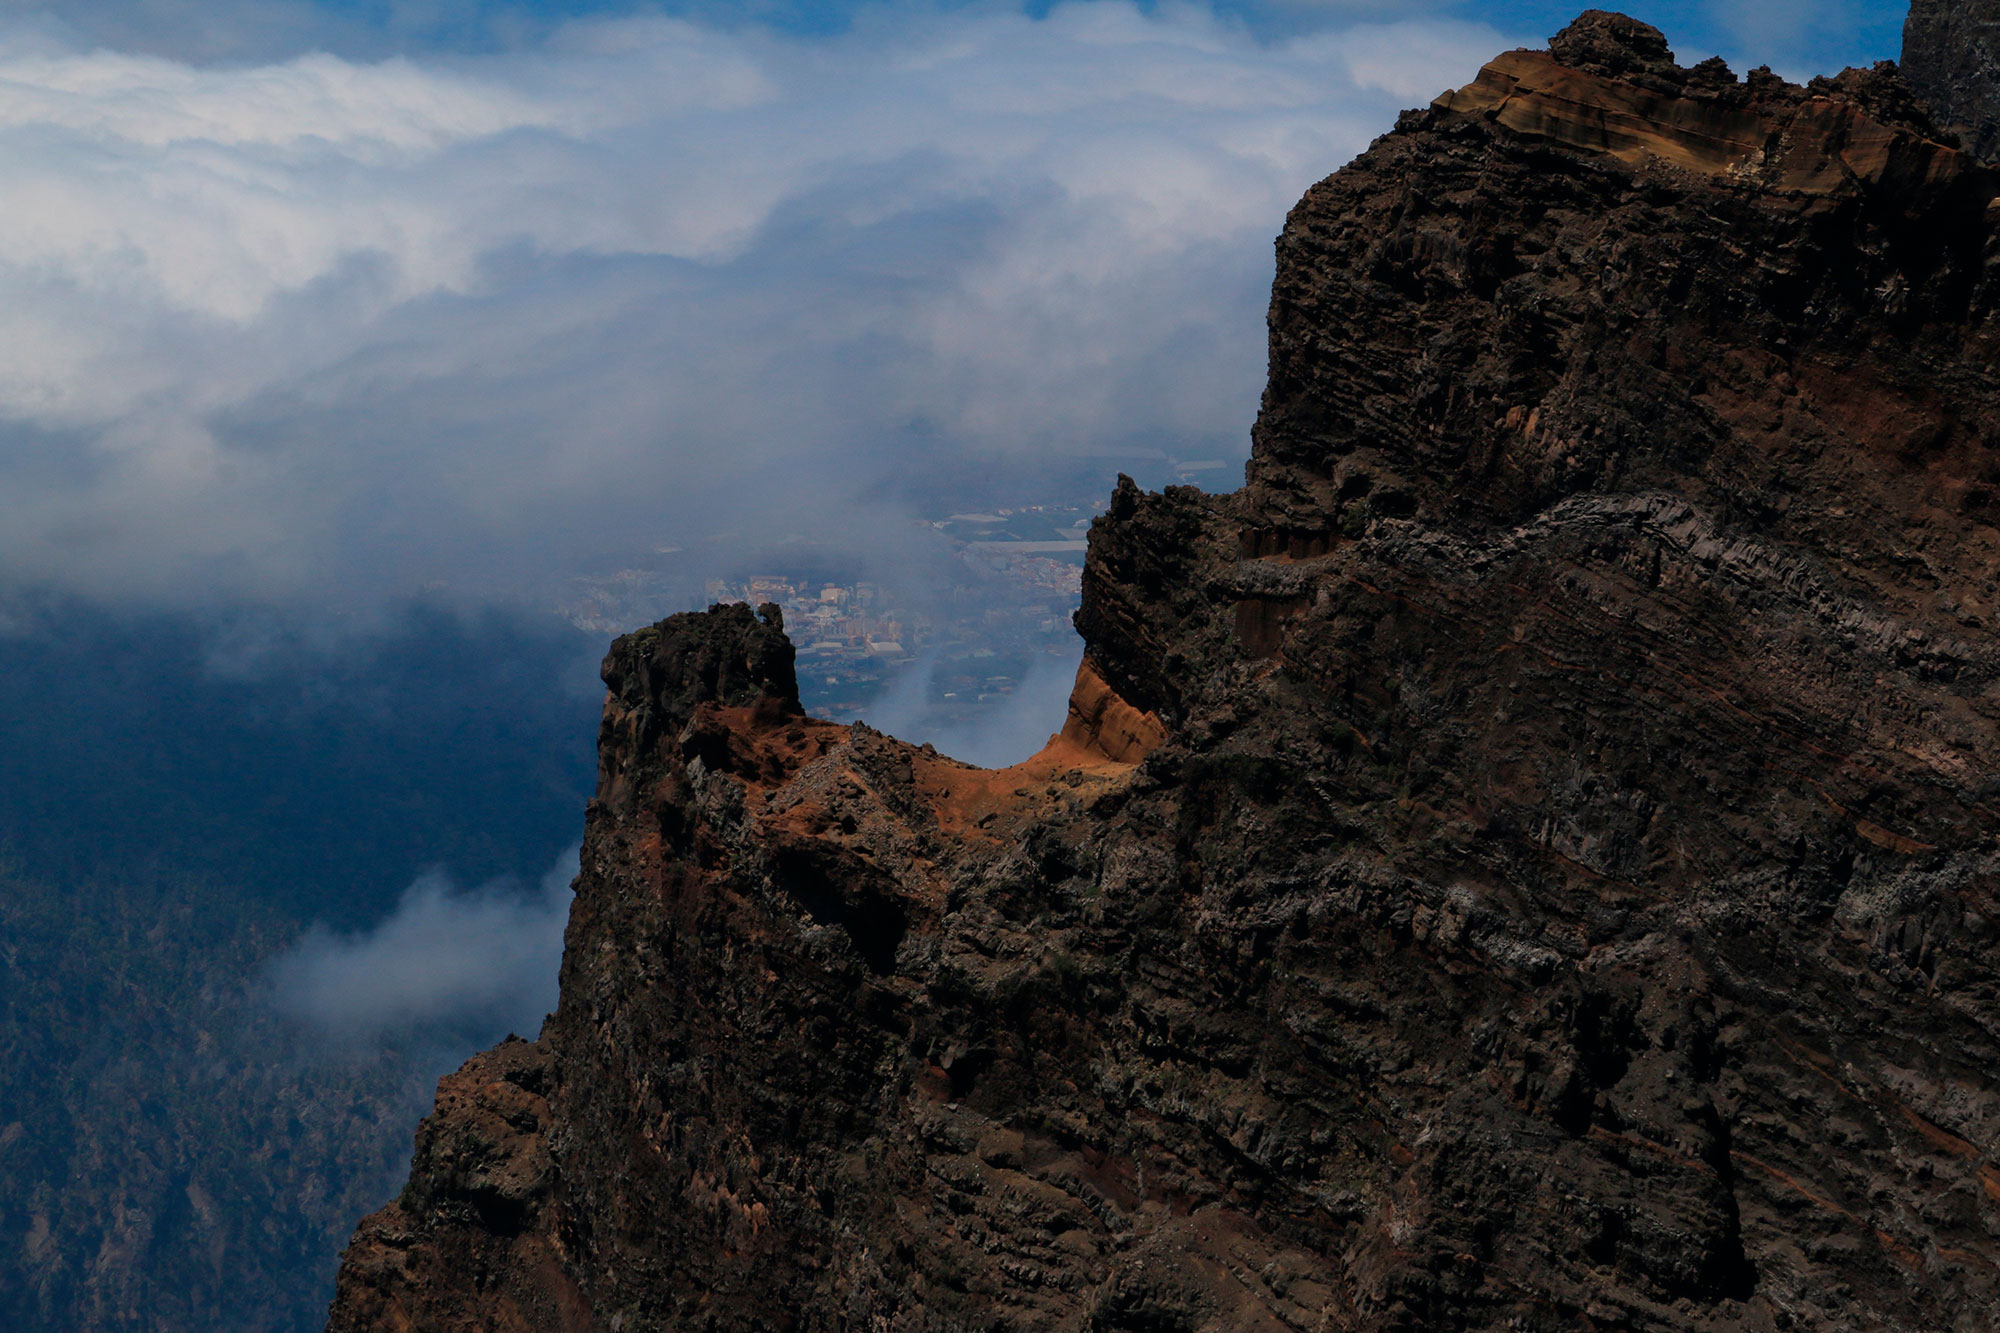 Naturaleza mágica, paisajes increibles, Islas Canarias - España- imagen #5